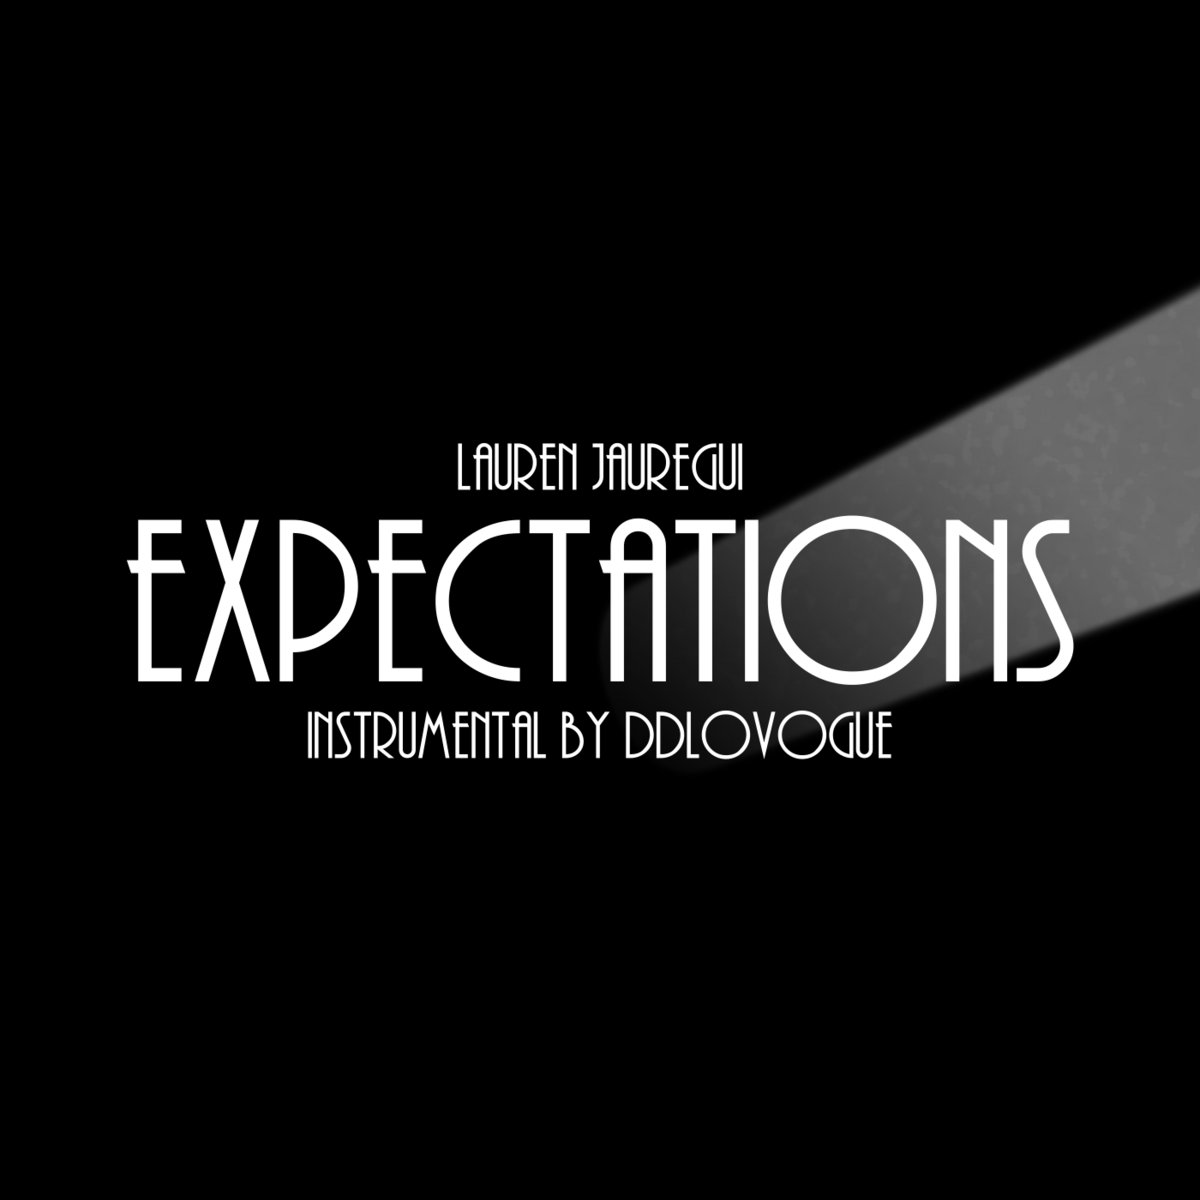 Lauren Jauregui - Expectations (Karaoke / Instrumental by ddlovogue